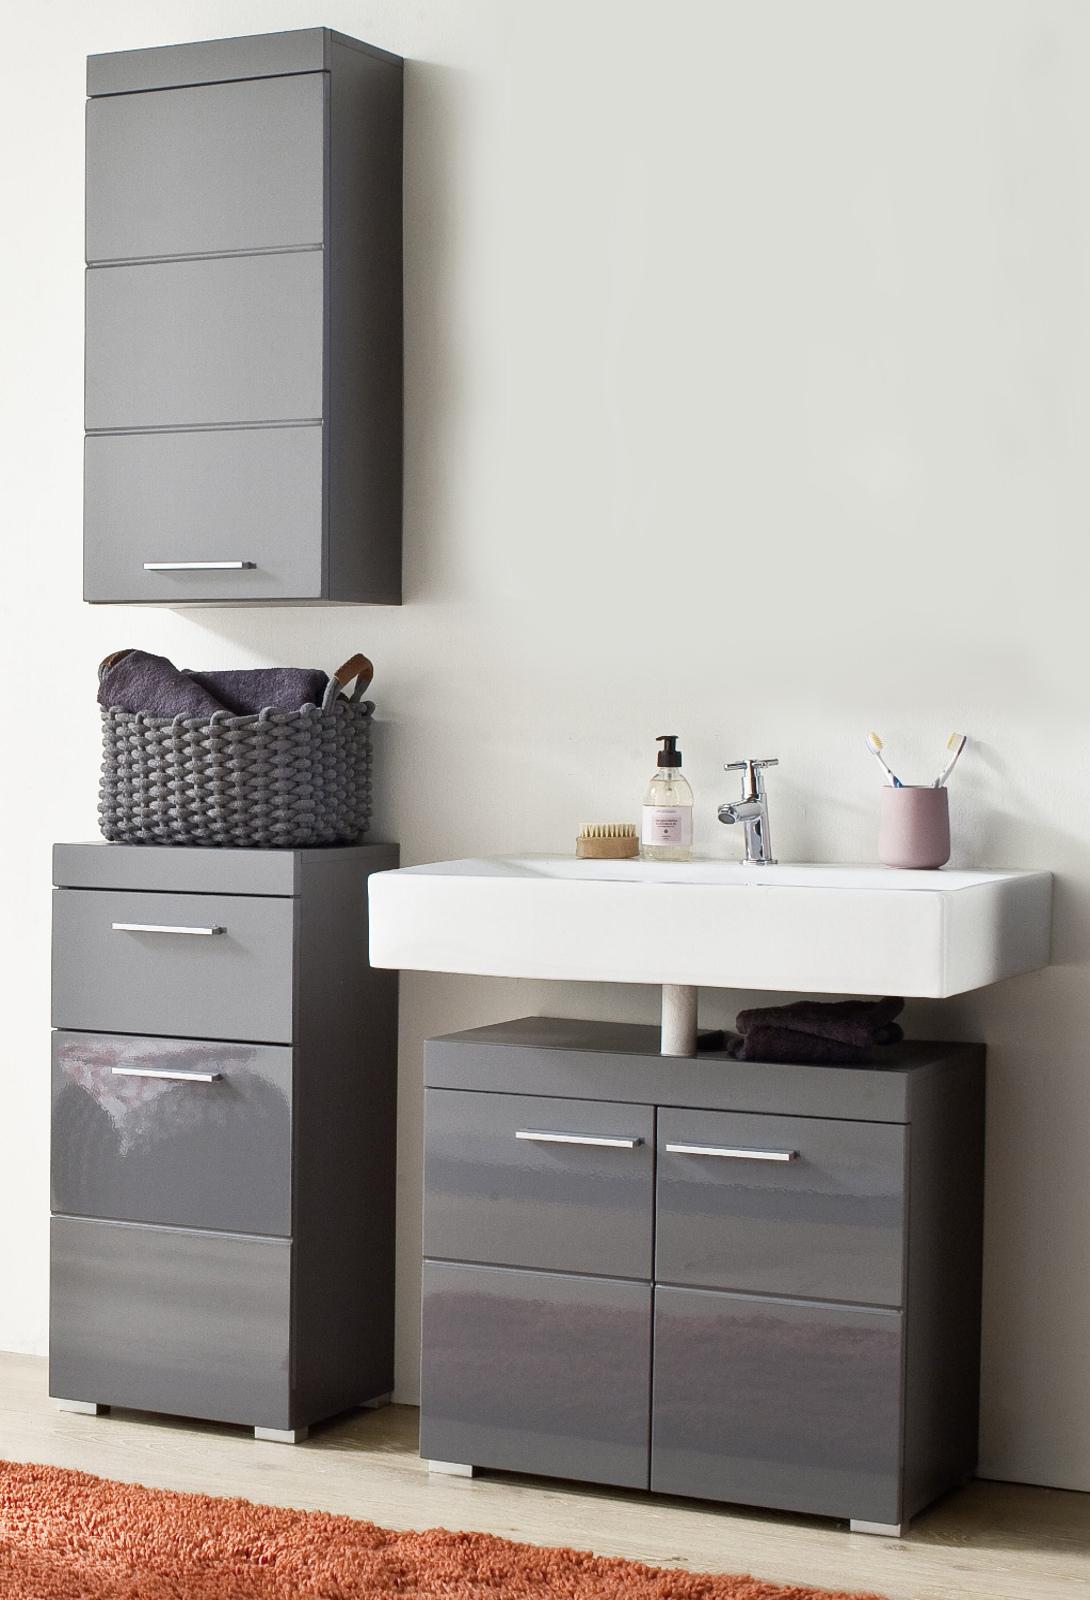 badm bel set amanda in hochglanz grau 3 teilig. Black Bedroom Furniture Sets. Home Design Ideas